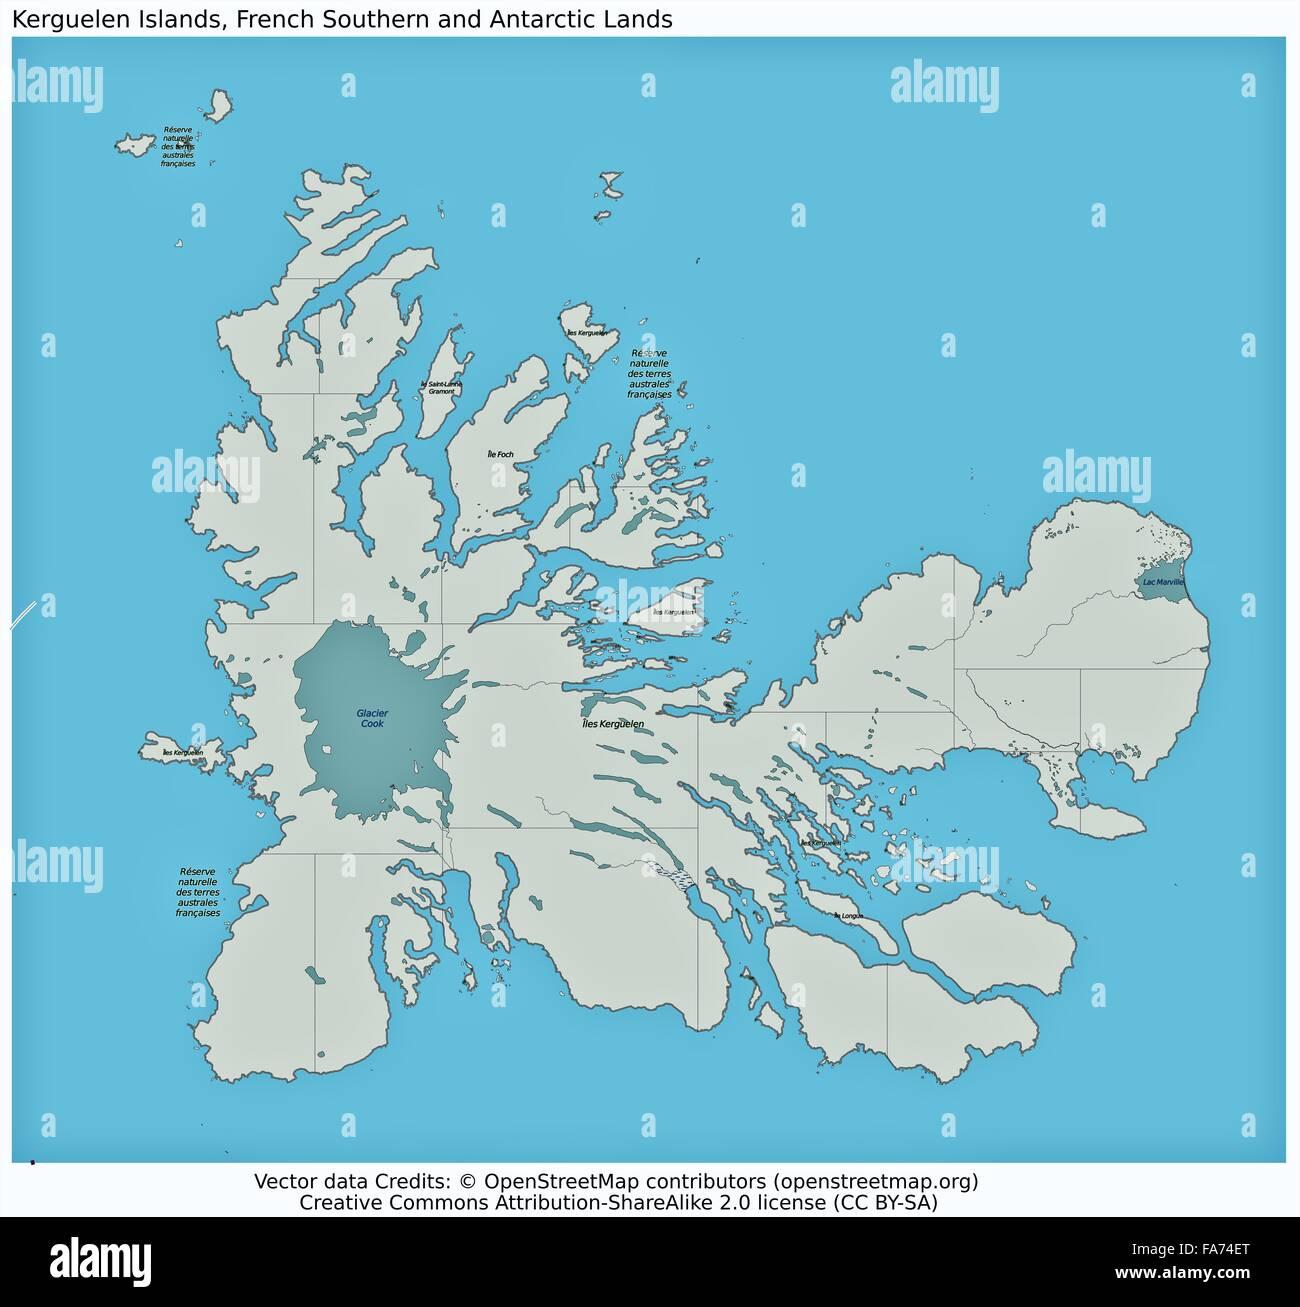 Kerguelen France location map Stock Photo 92355616 Alamy